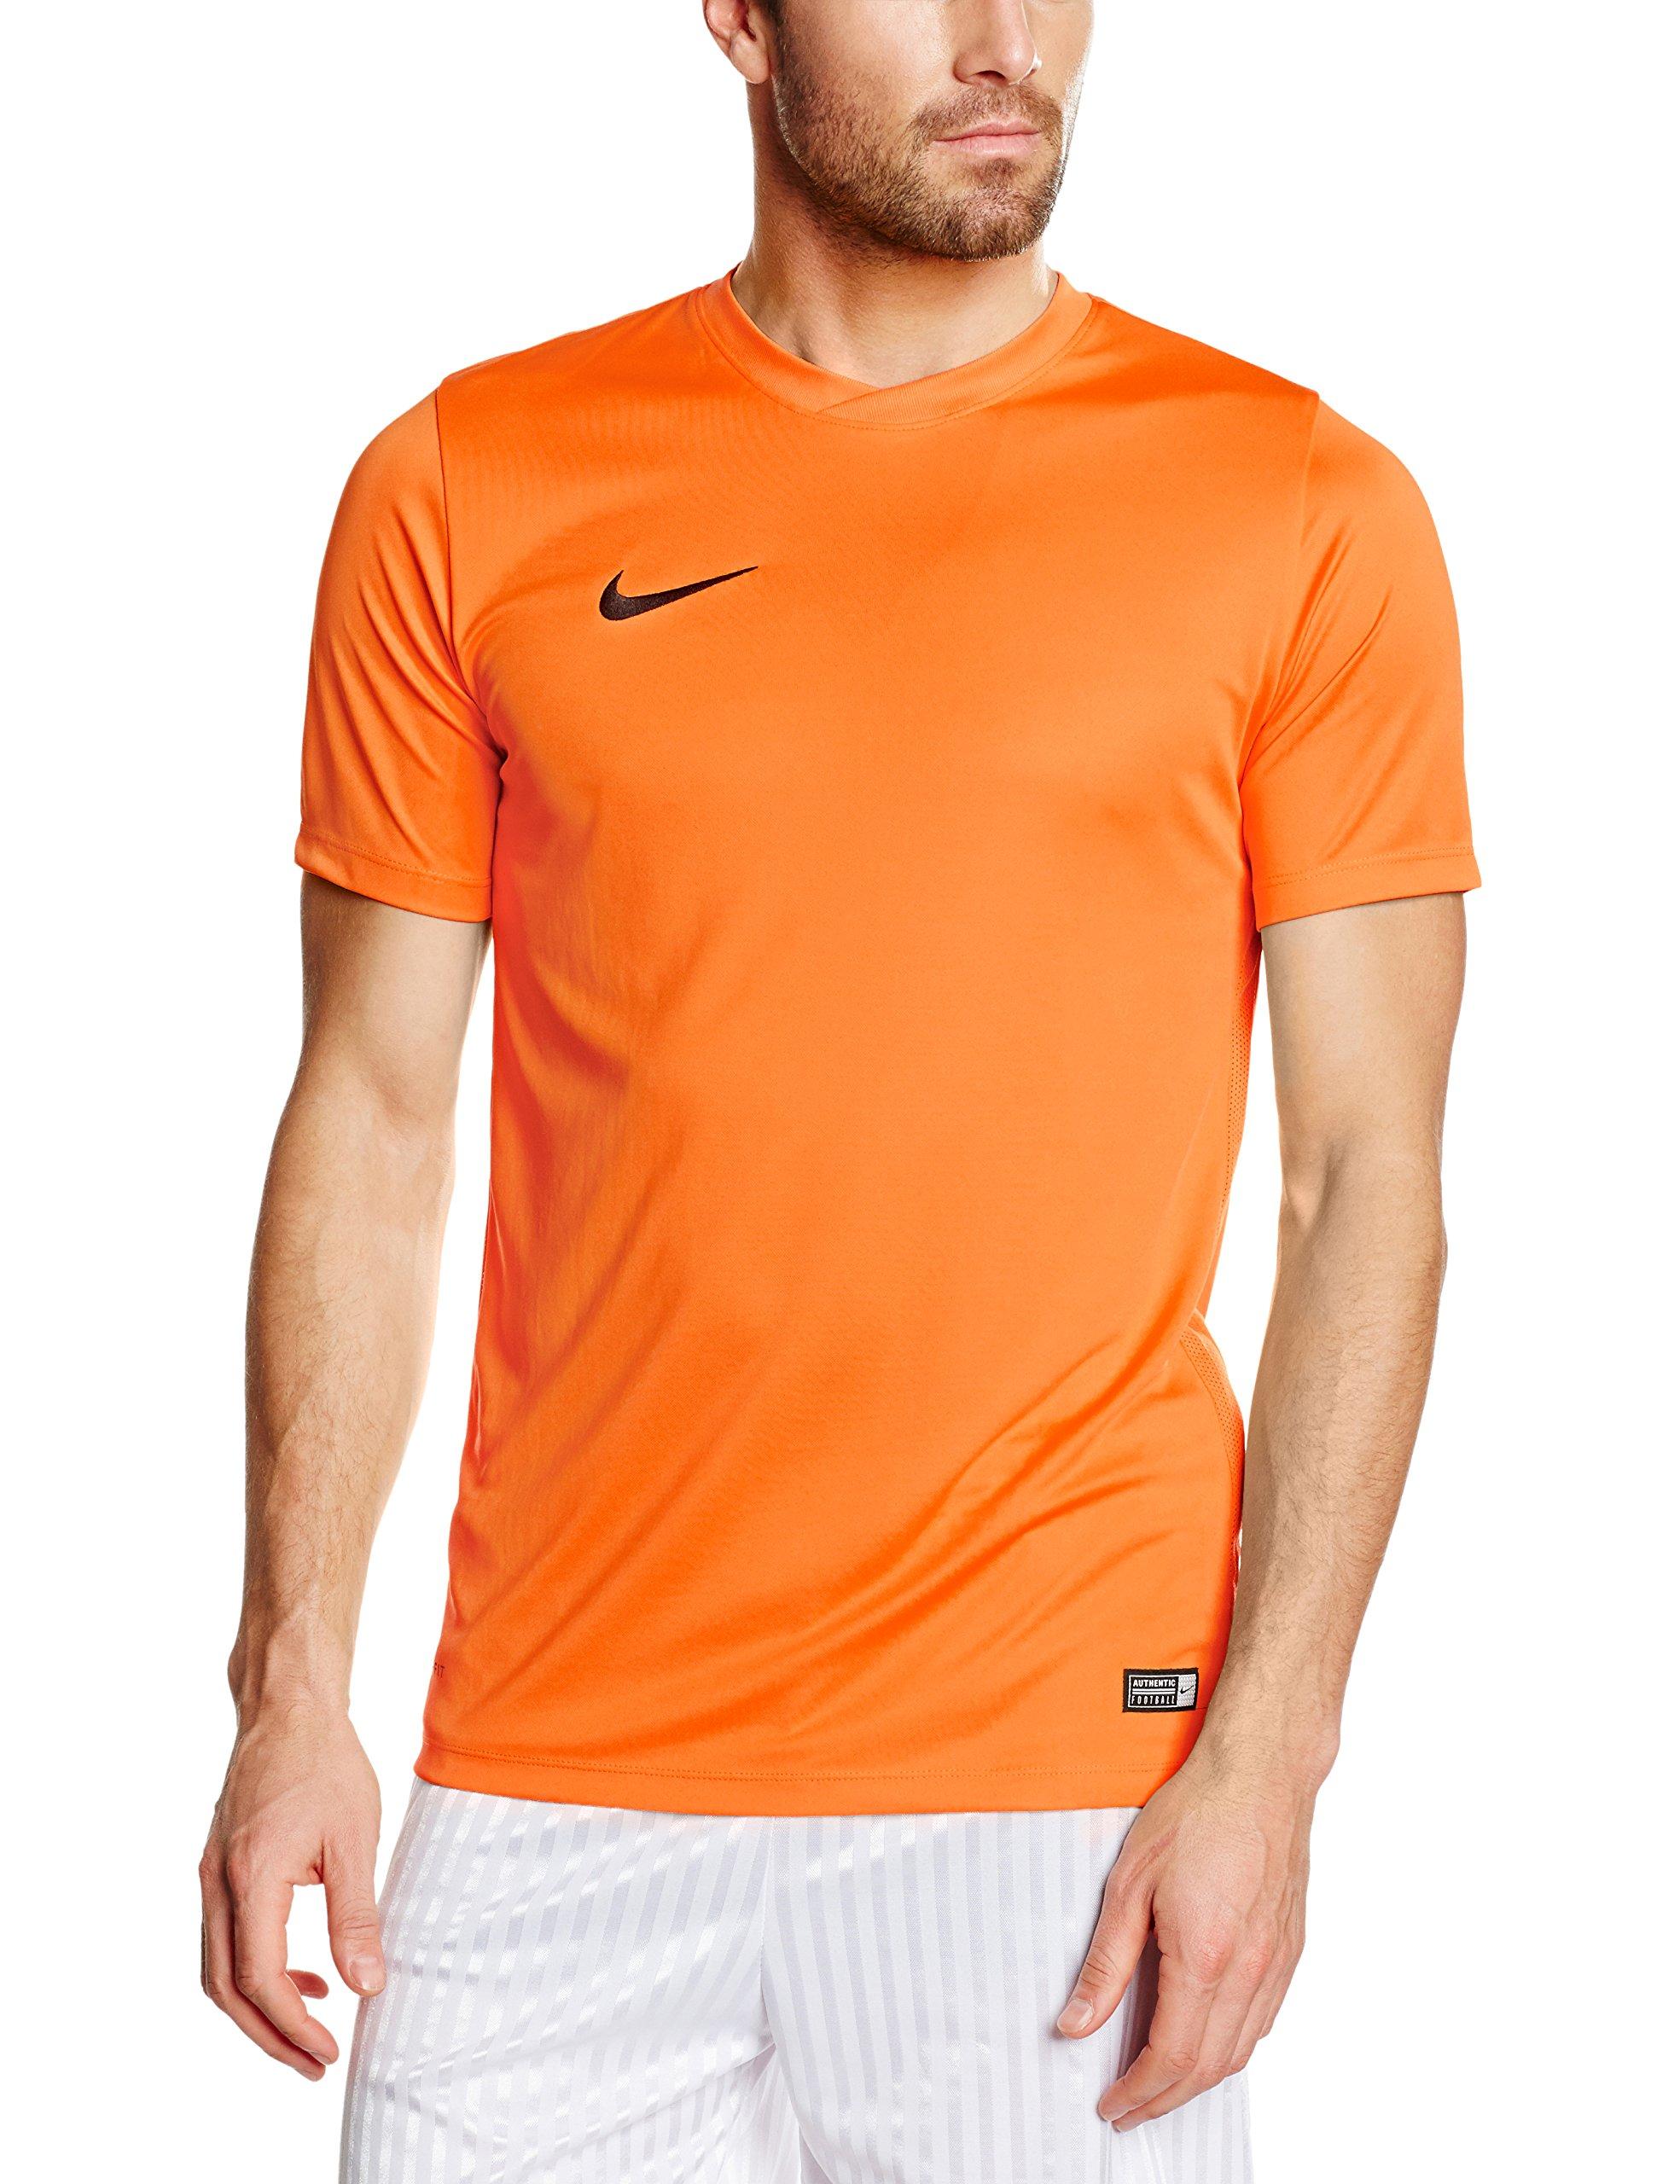 Nike Park VI Camiseta de Manga Corta para hombre, Naranja (Safety Naranja/Black